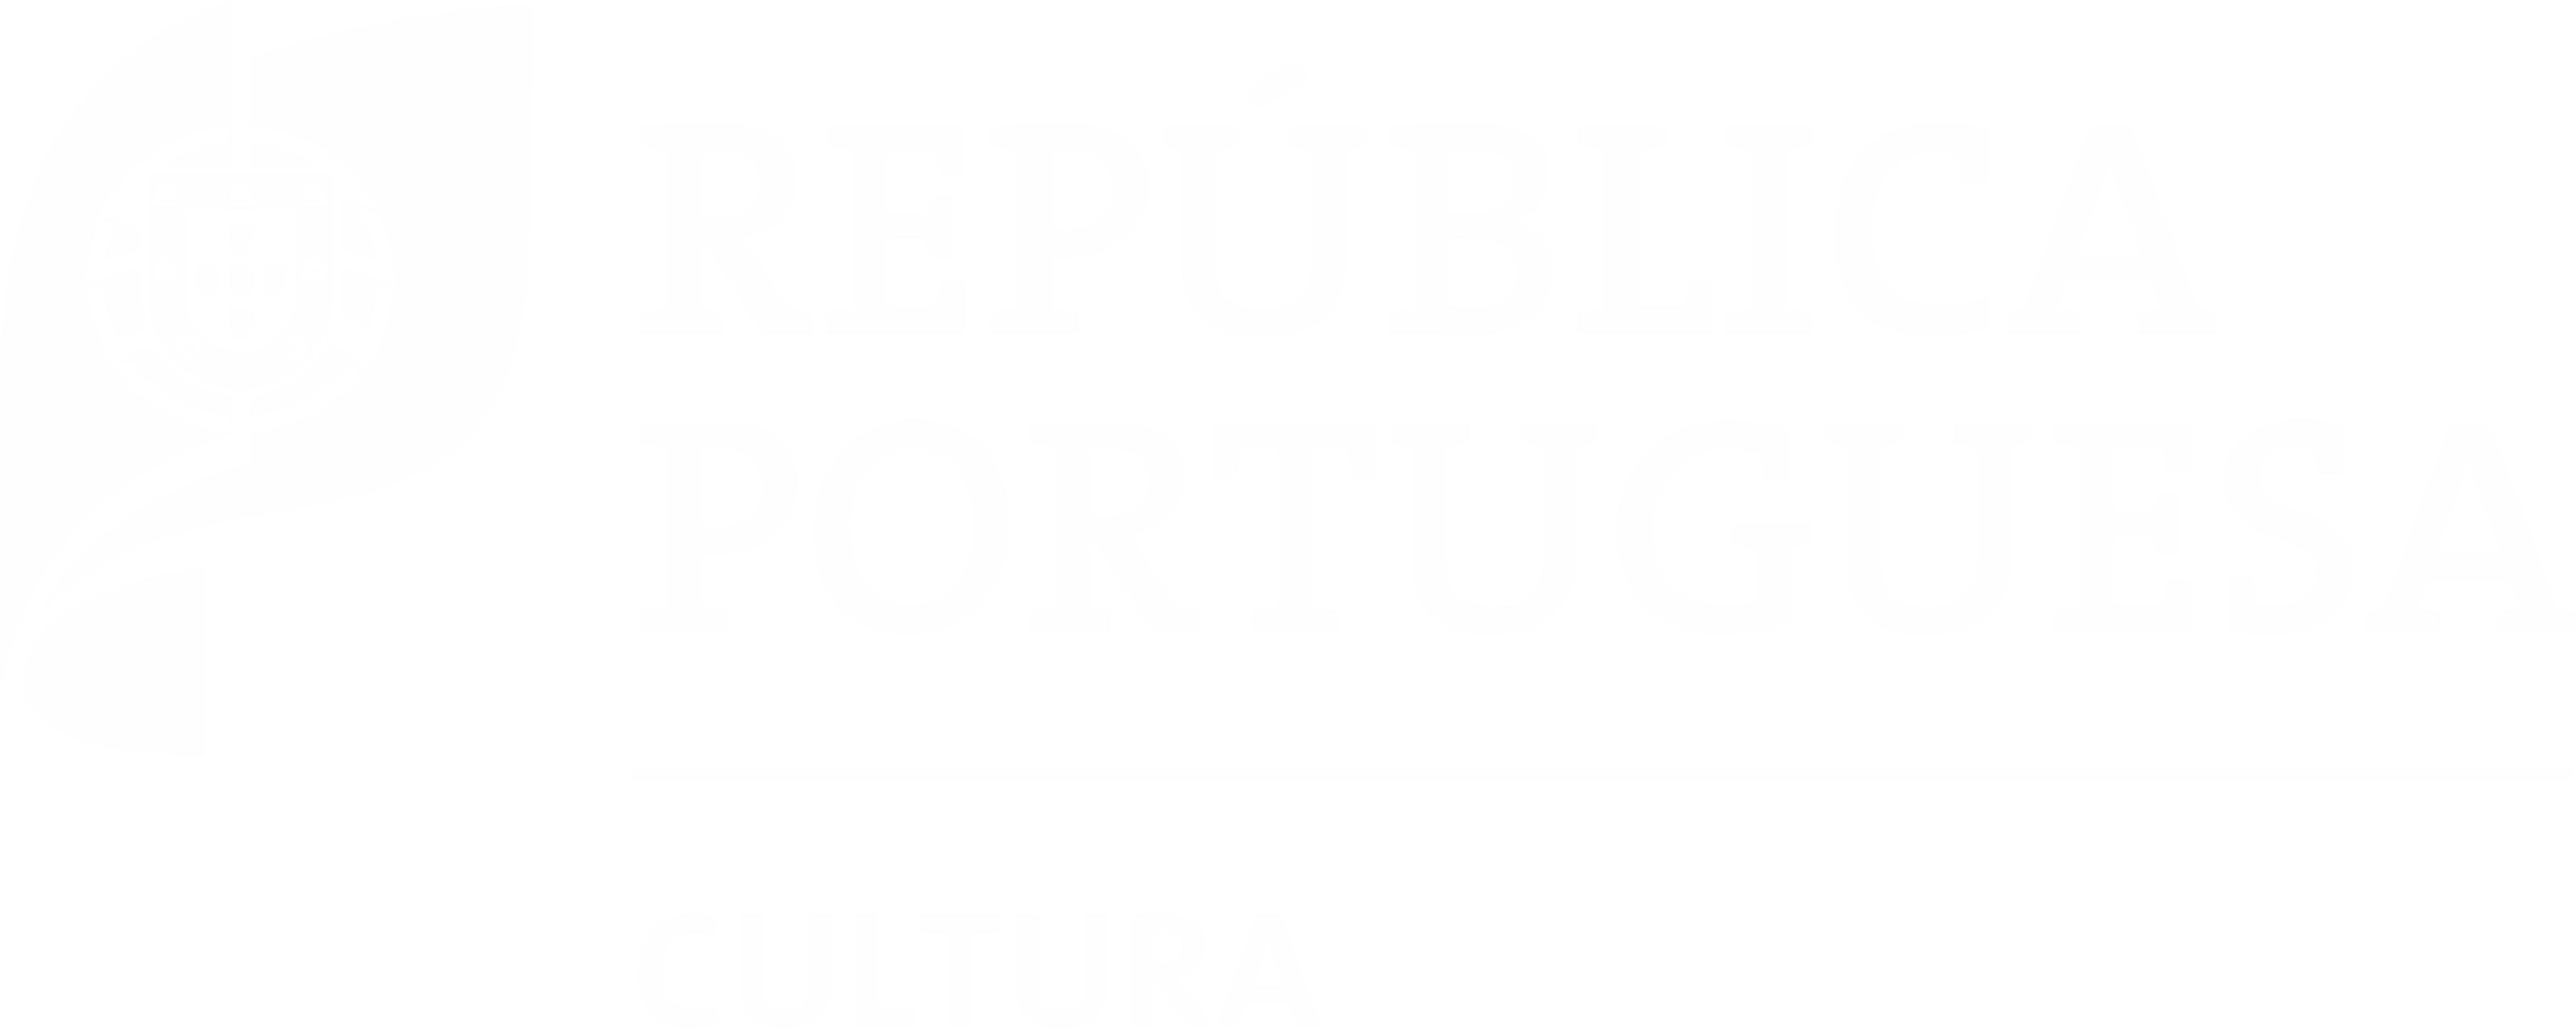 REPUBLICA PORTUGUESA CULTURA branco